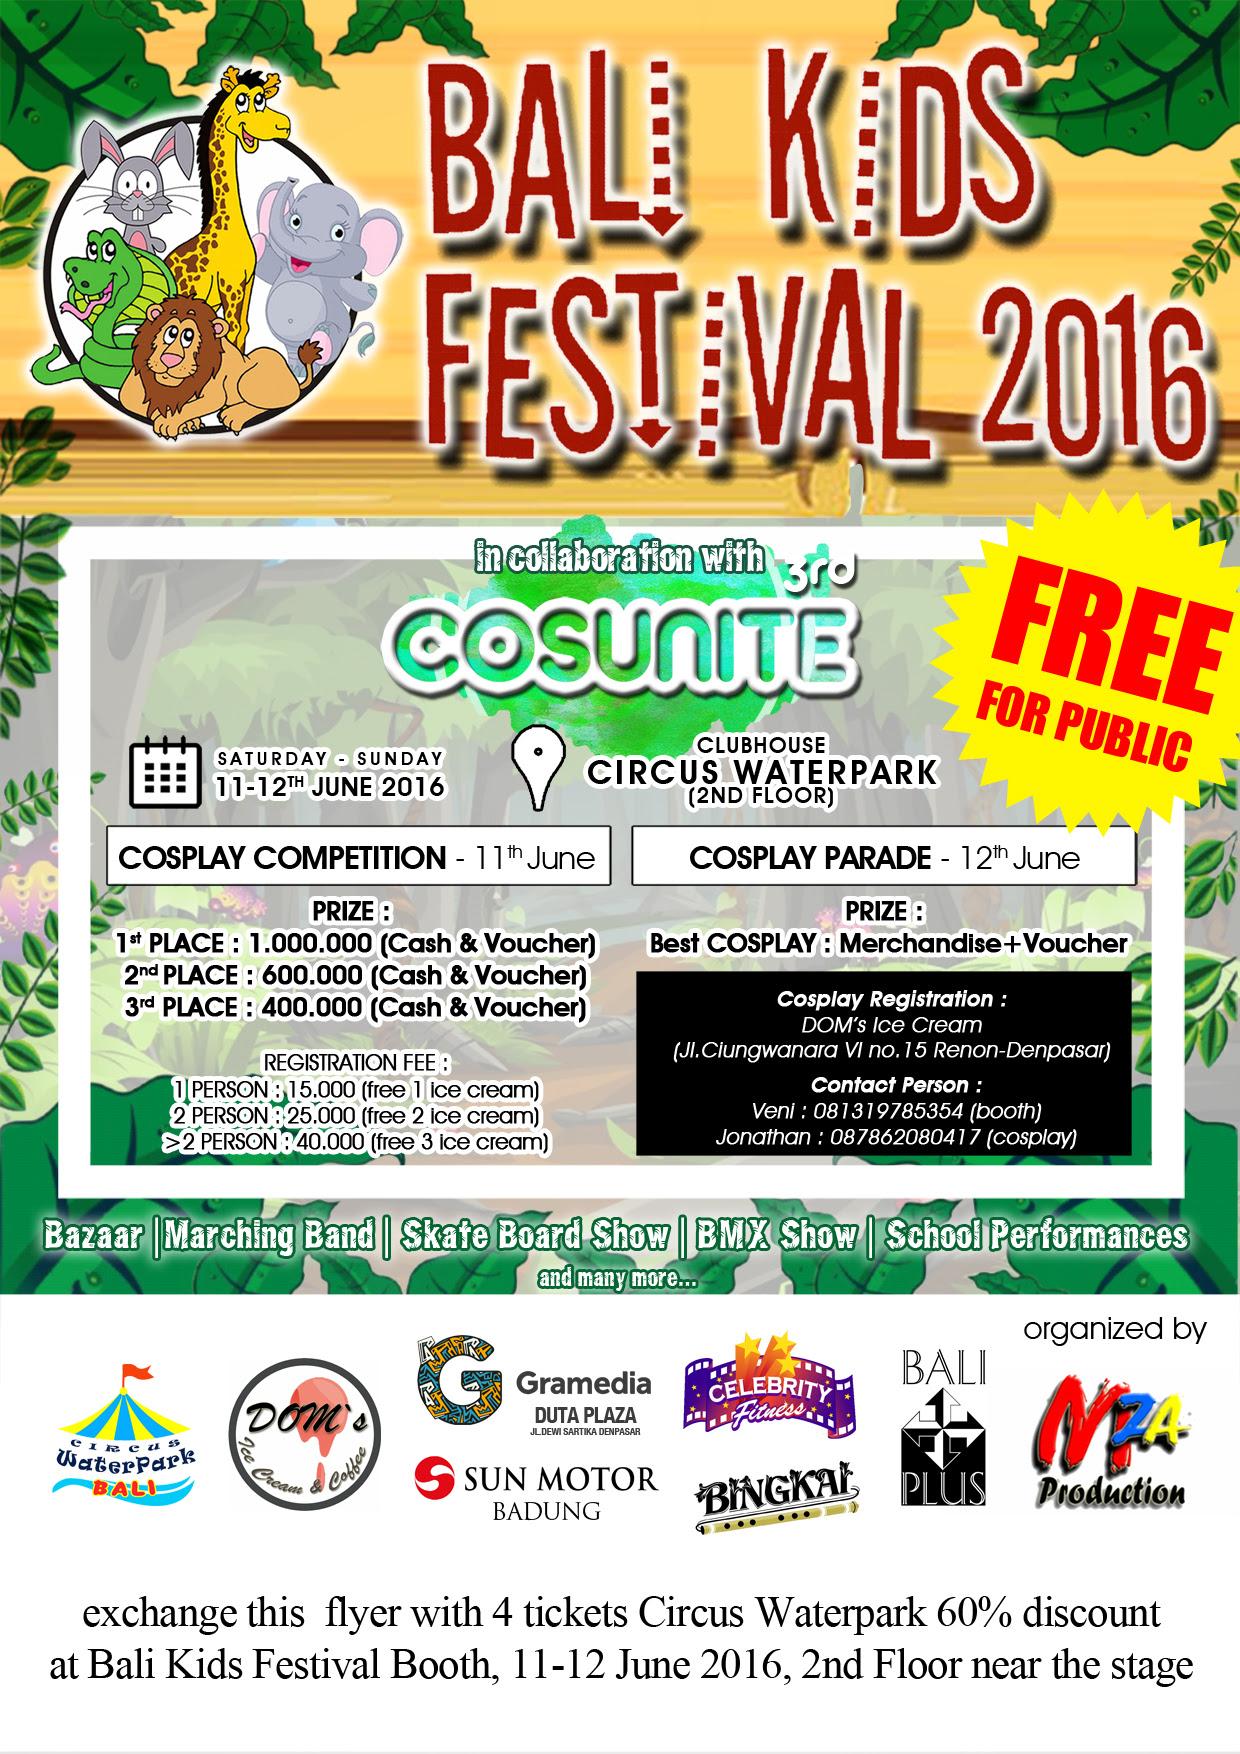 Bali-Kids-Festival-2016